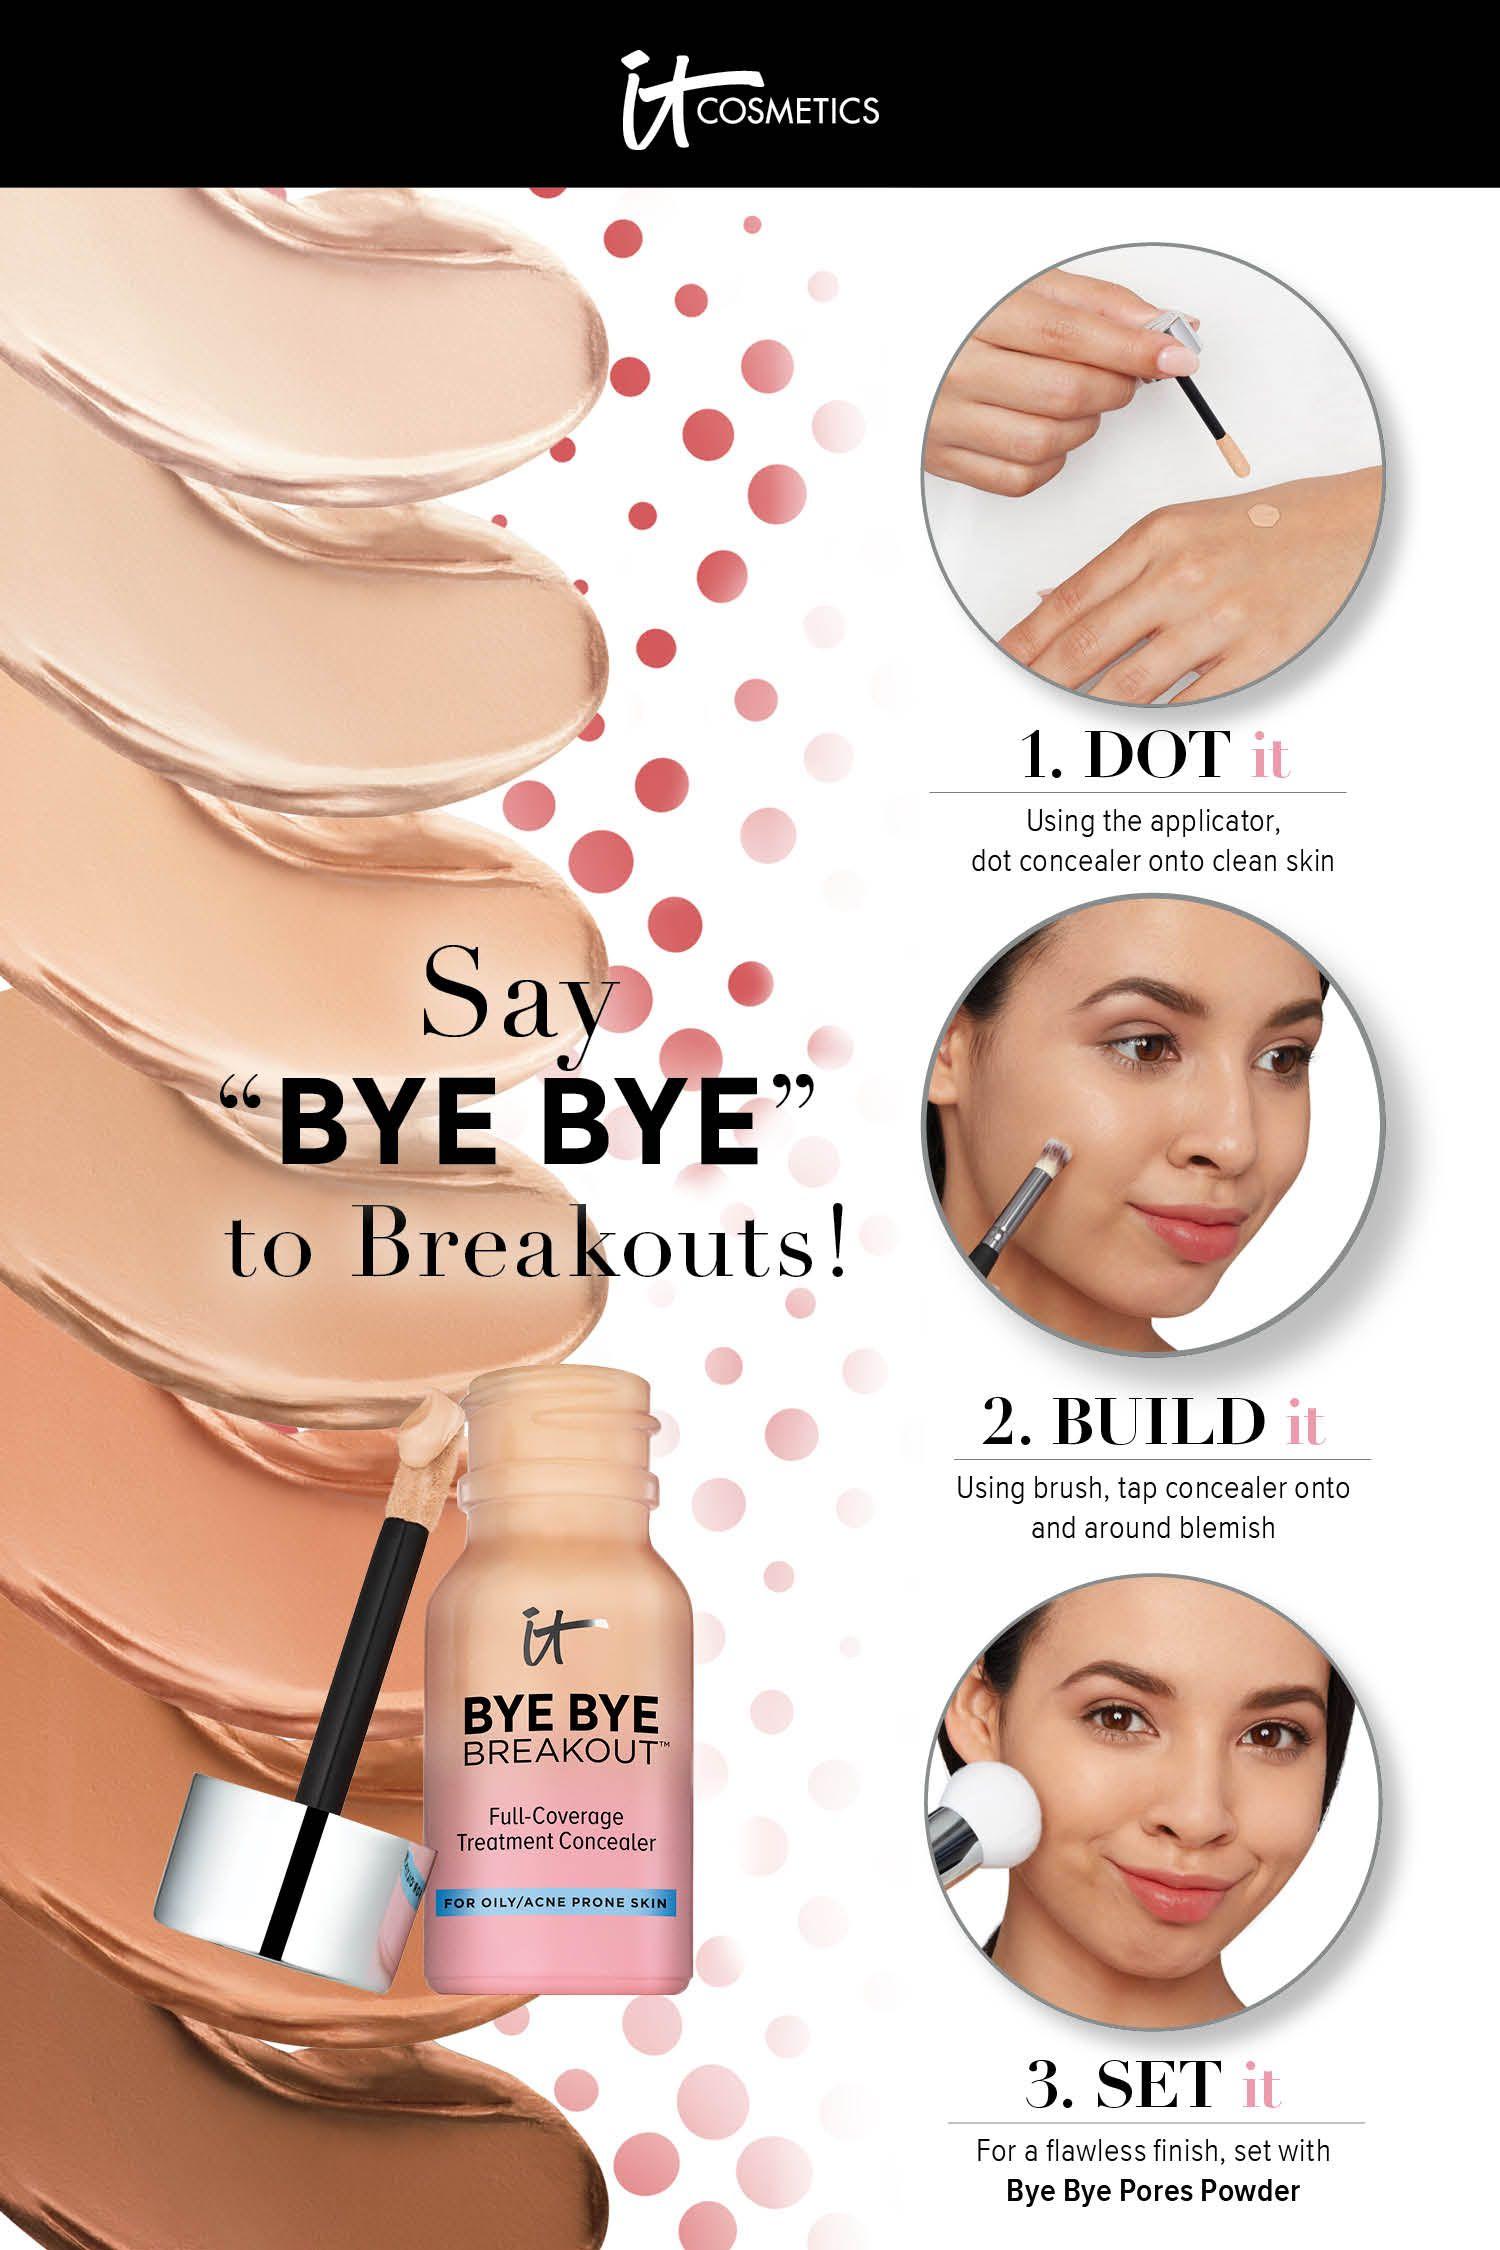 Bye Bye Breakout FullCoverage Concealer Best acne spot